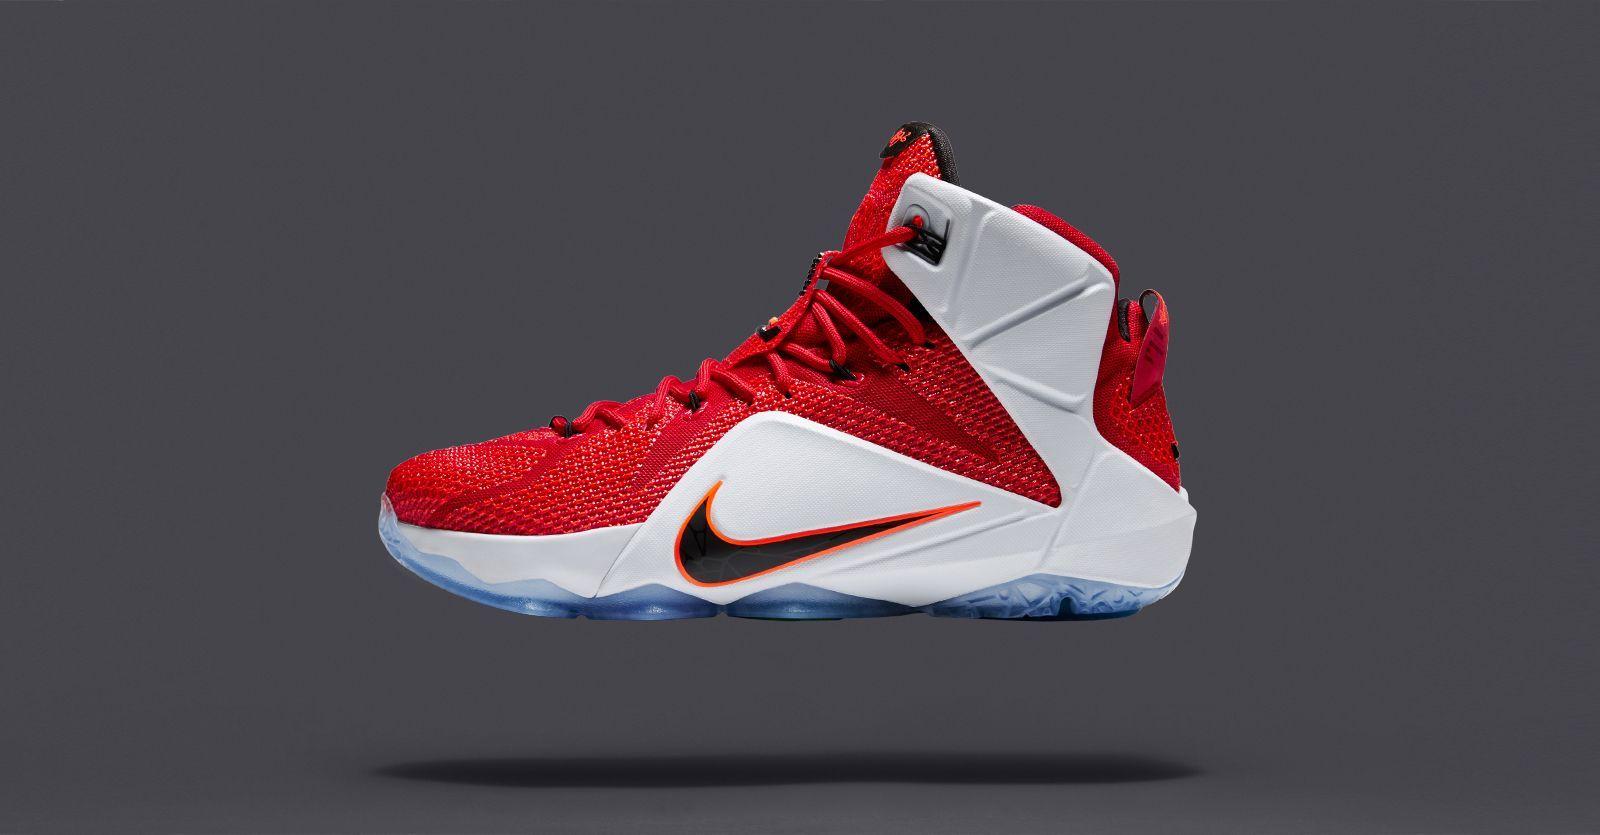 bfd9ea3b527b canada 13 christmas lebron 13s 086db 12269  reduced nike lebron shoes price  fba95 b3eaa